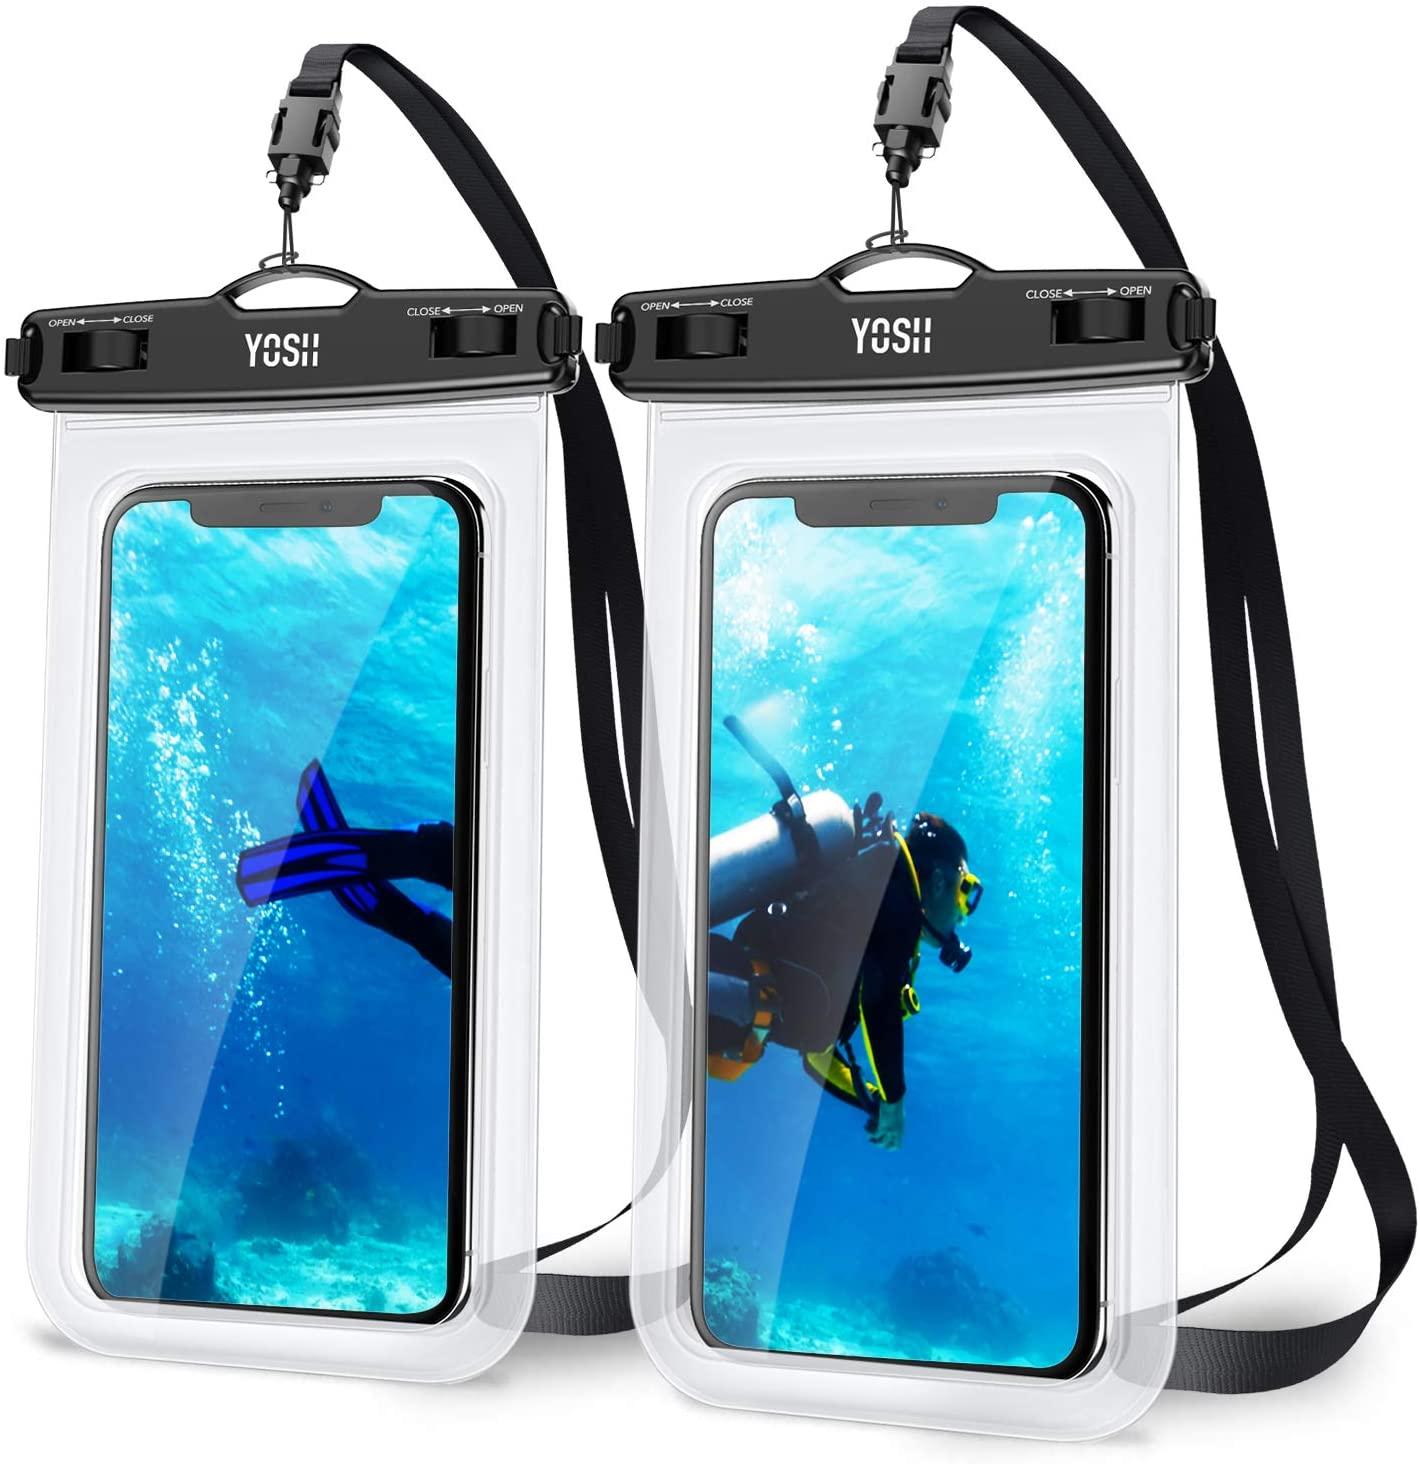 YOSH Waterproof Phone Case